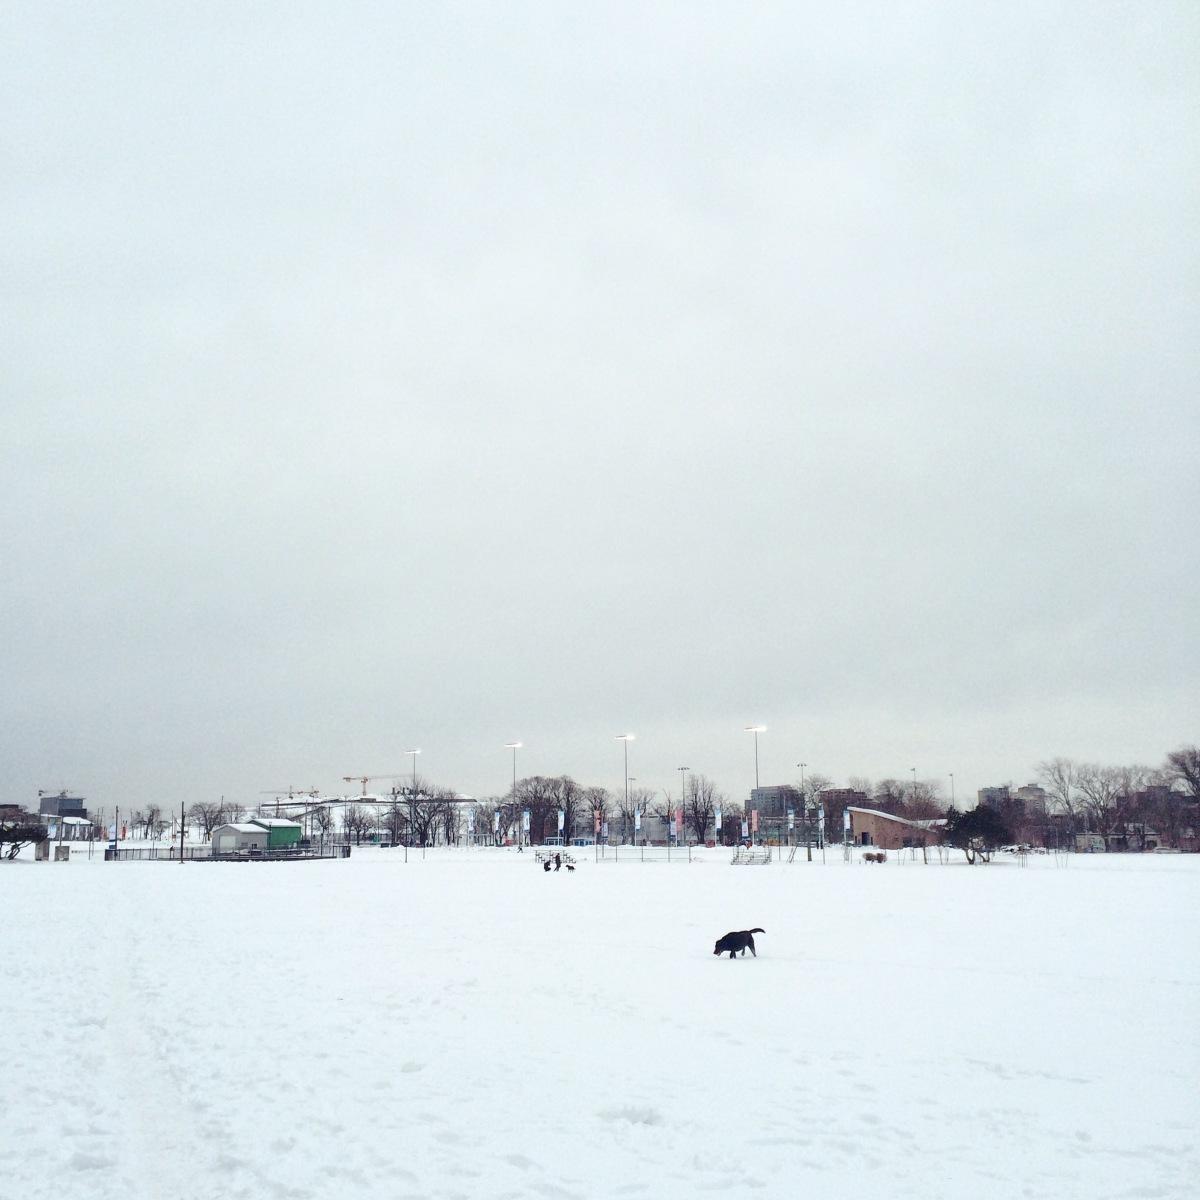 Halifax Common Off-Leash Dog